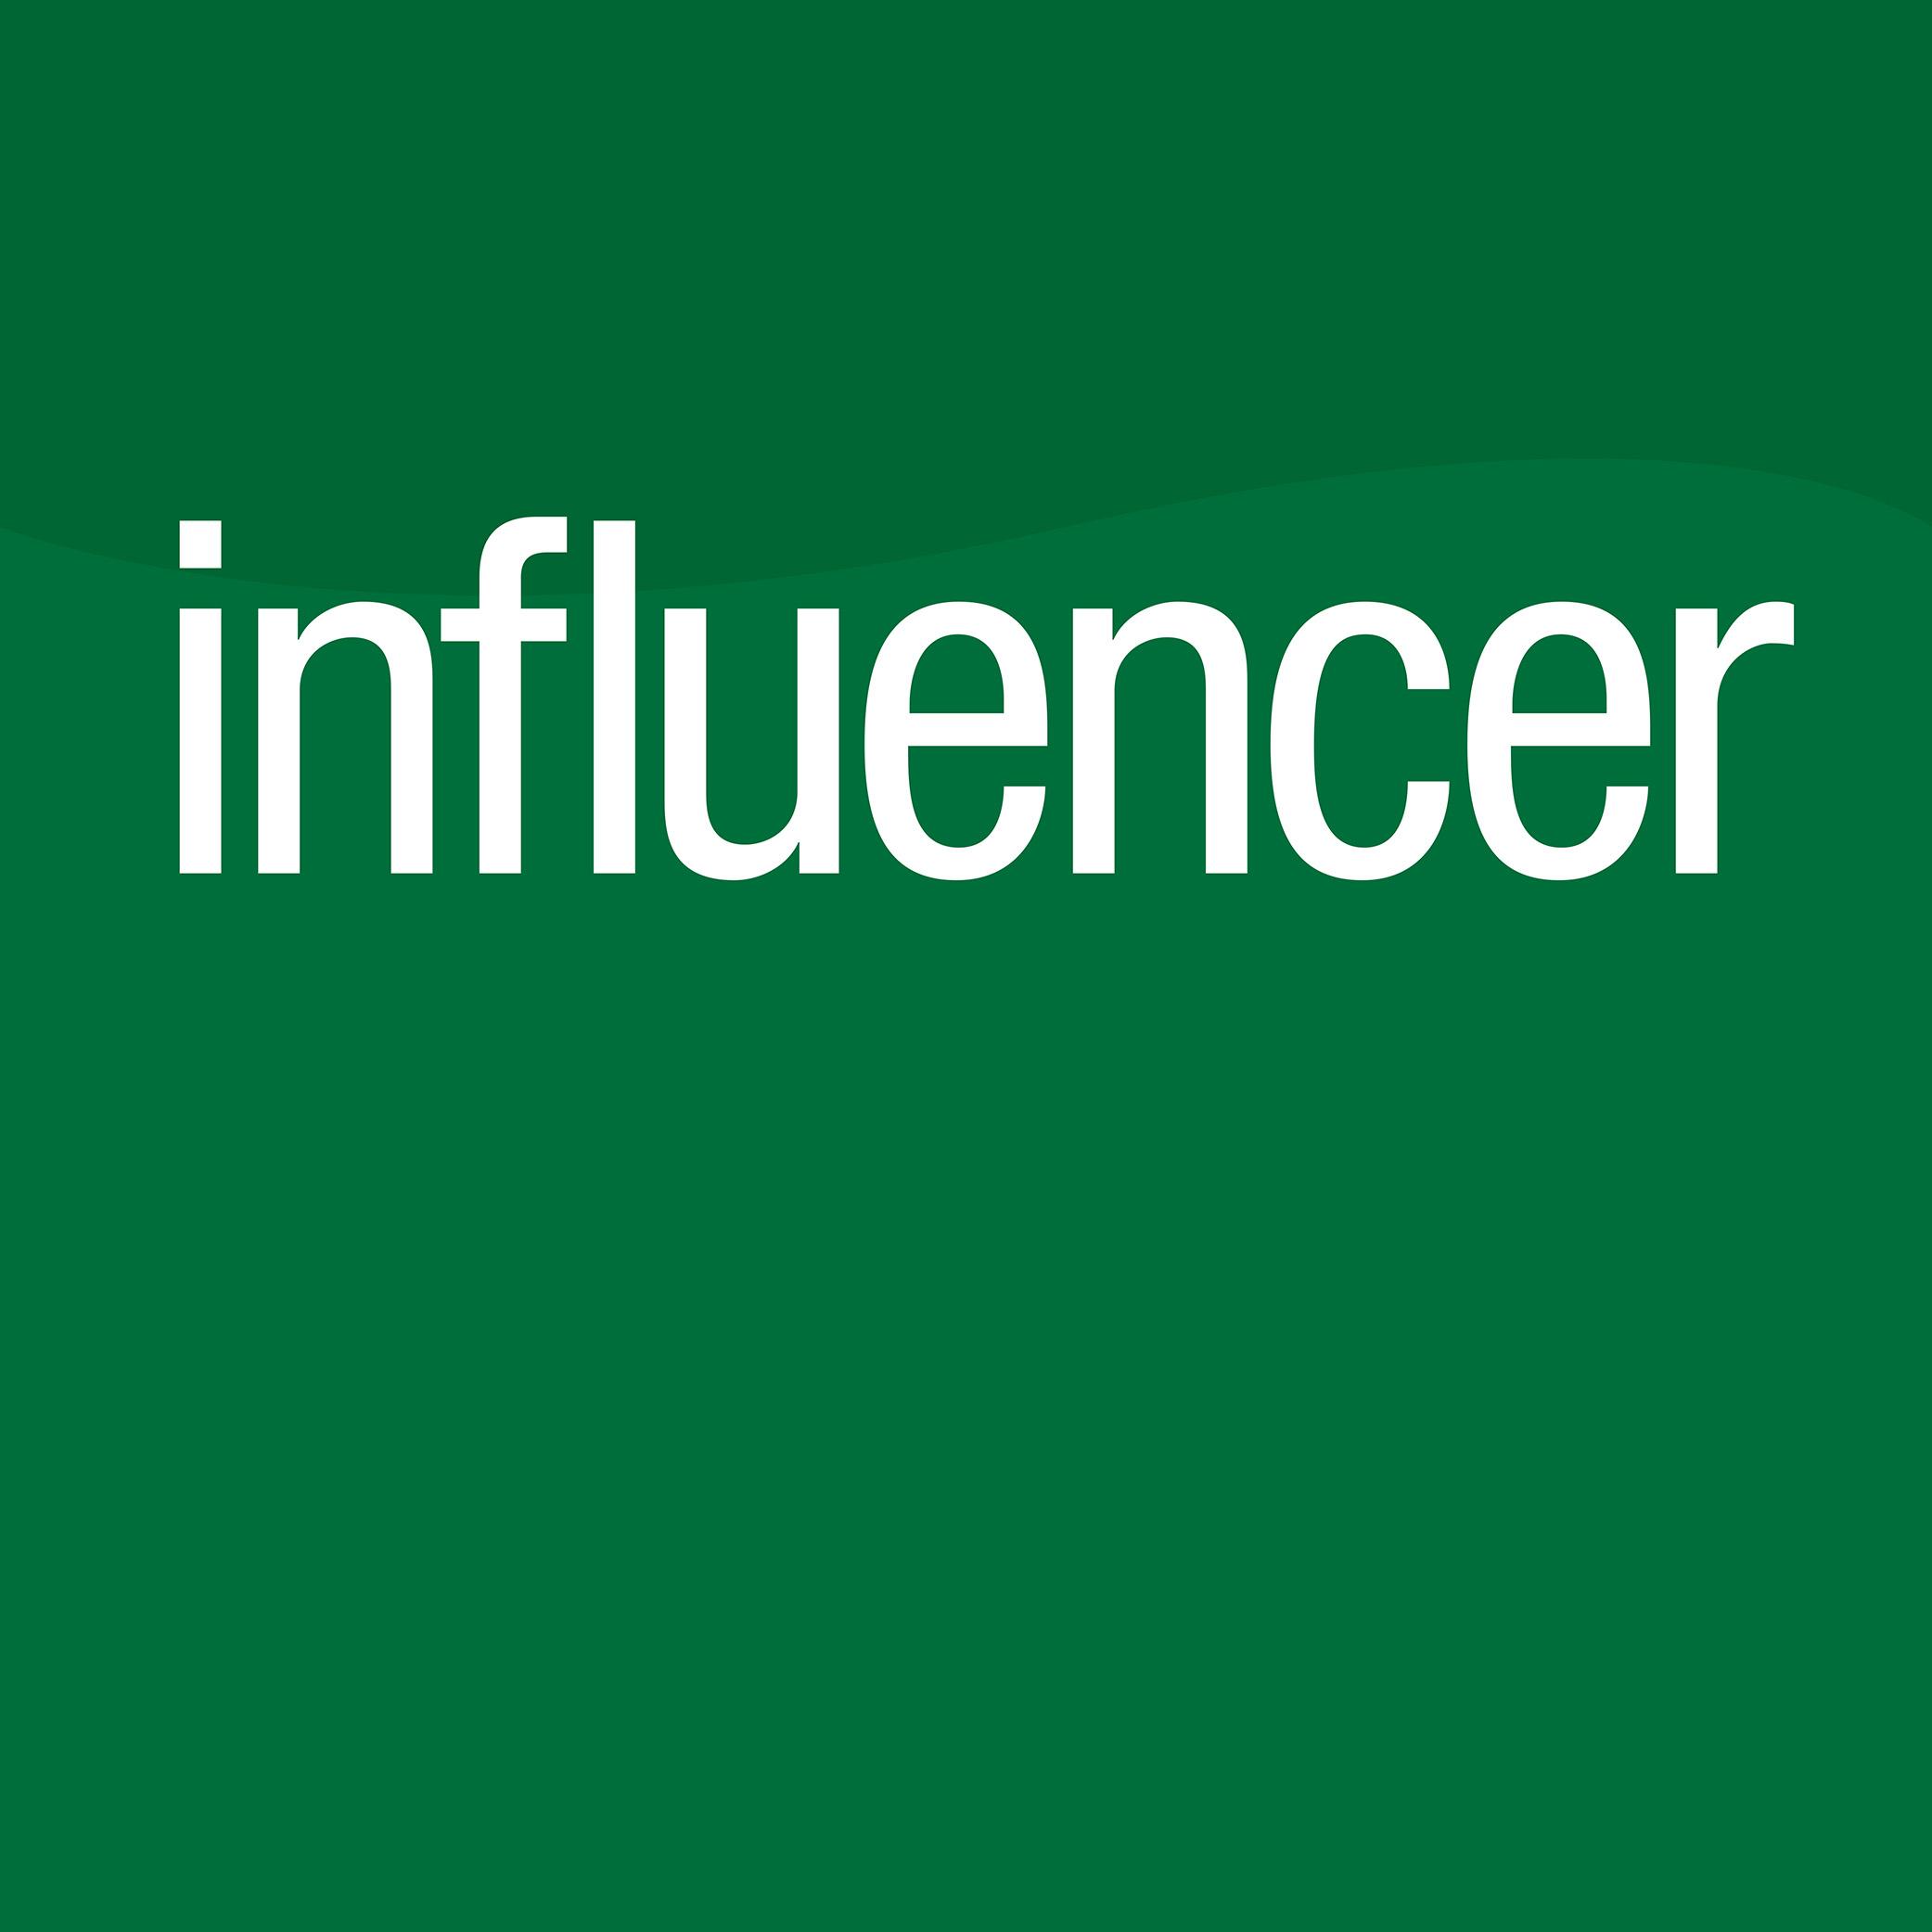 Influencer Product Logo Screen.jpg